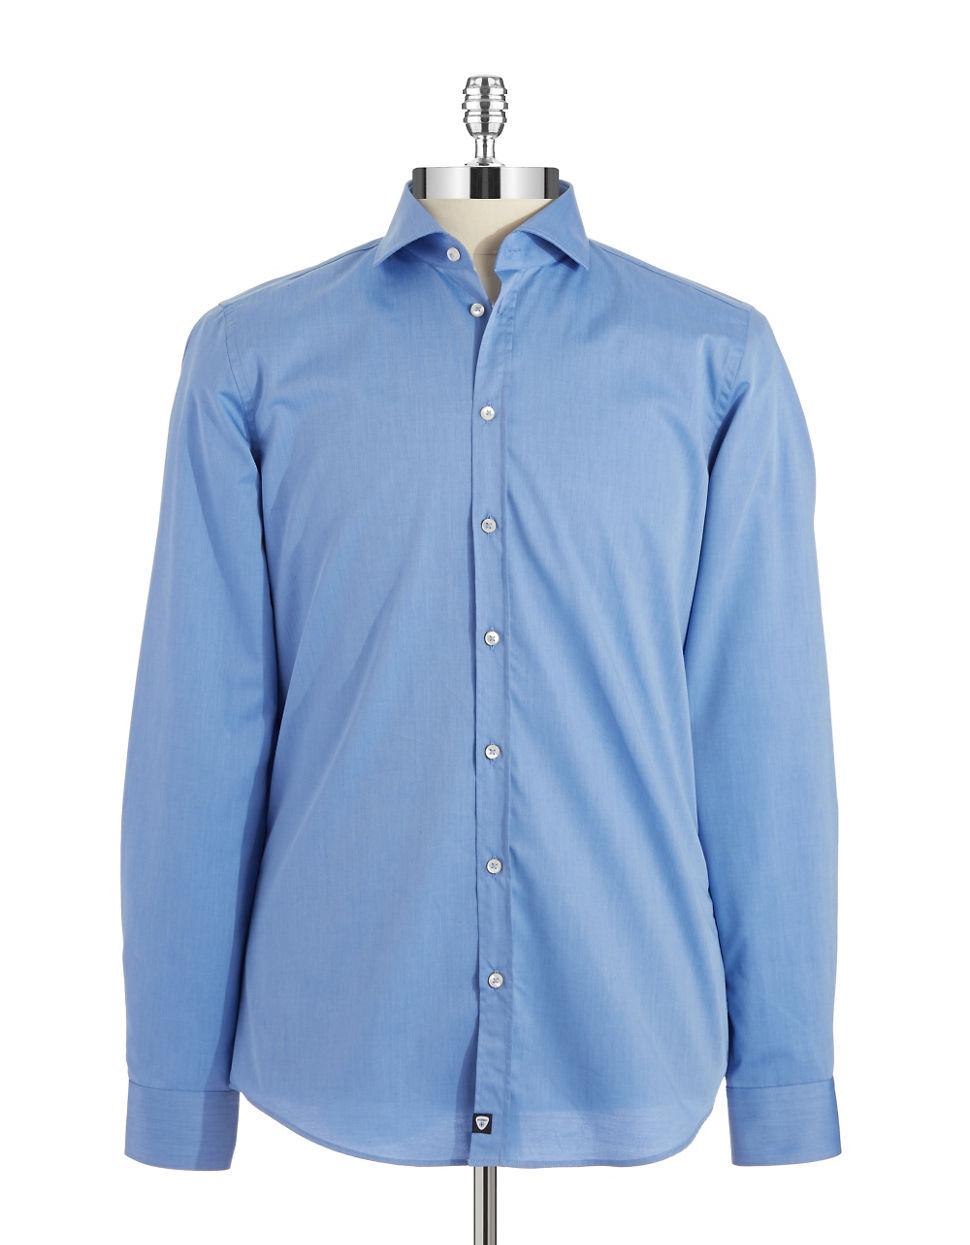 strellson jamie slim fit sportshirt in blue for men lyst. Black Bedroom Furniture Sets. Home Design Ideas